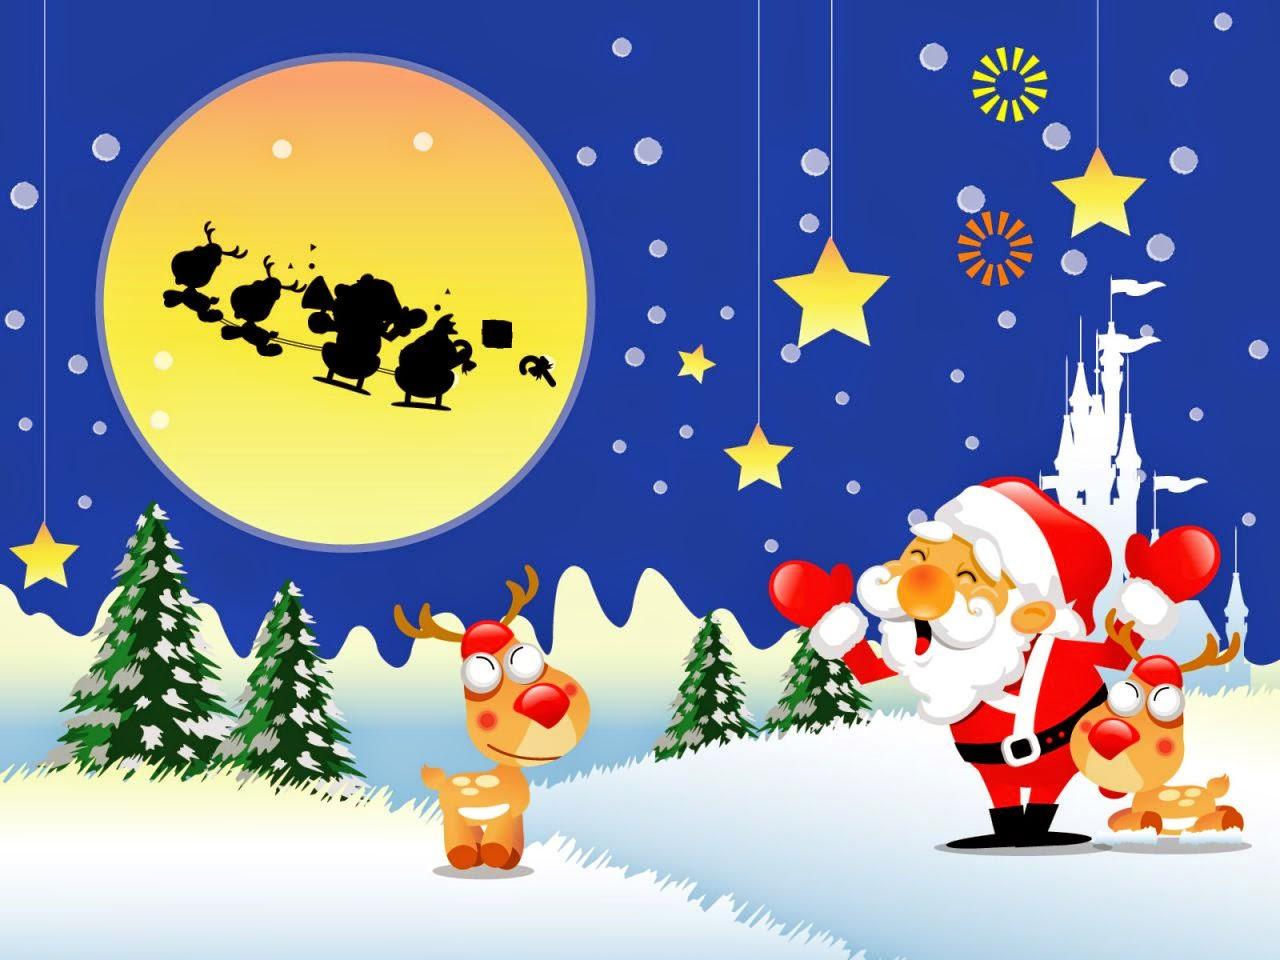 Santa-Claus-with-reindeer-cartoon-image-for-chidren-Christmas-card-1280x960.jpg